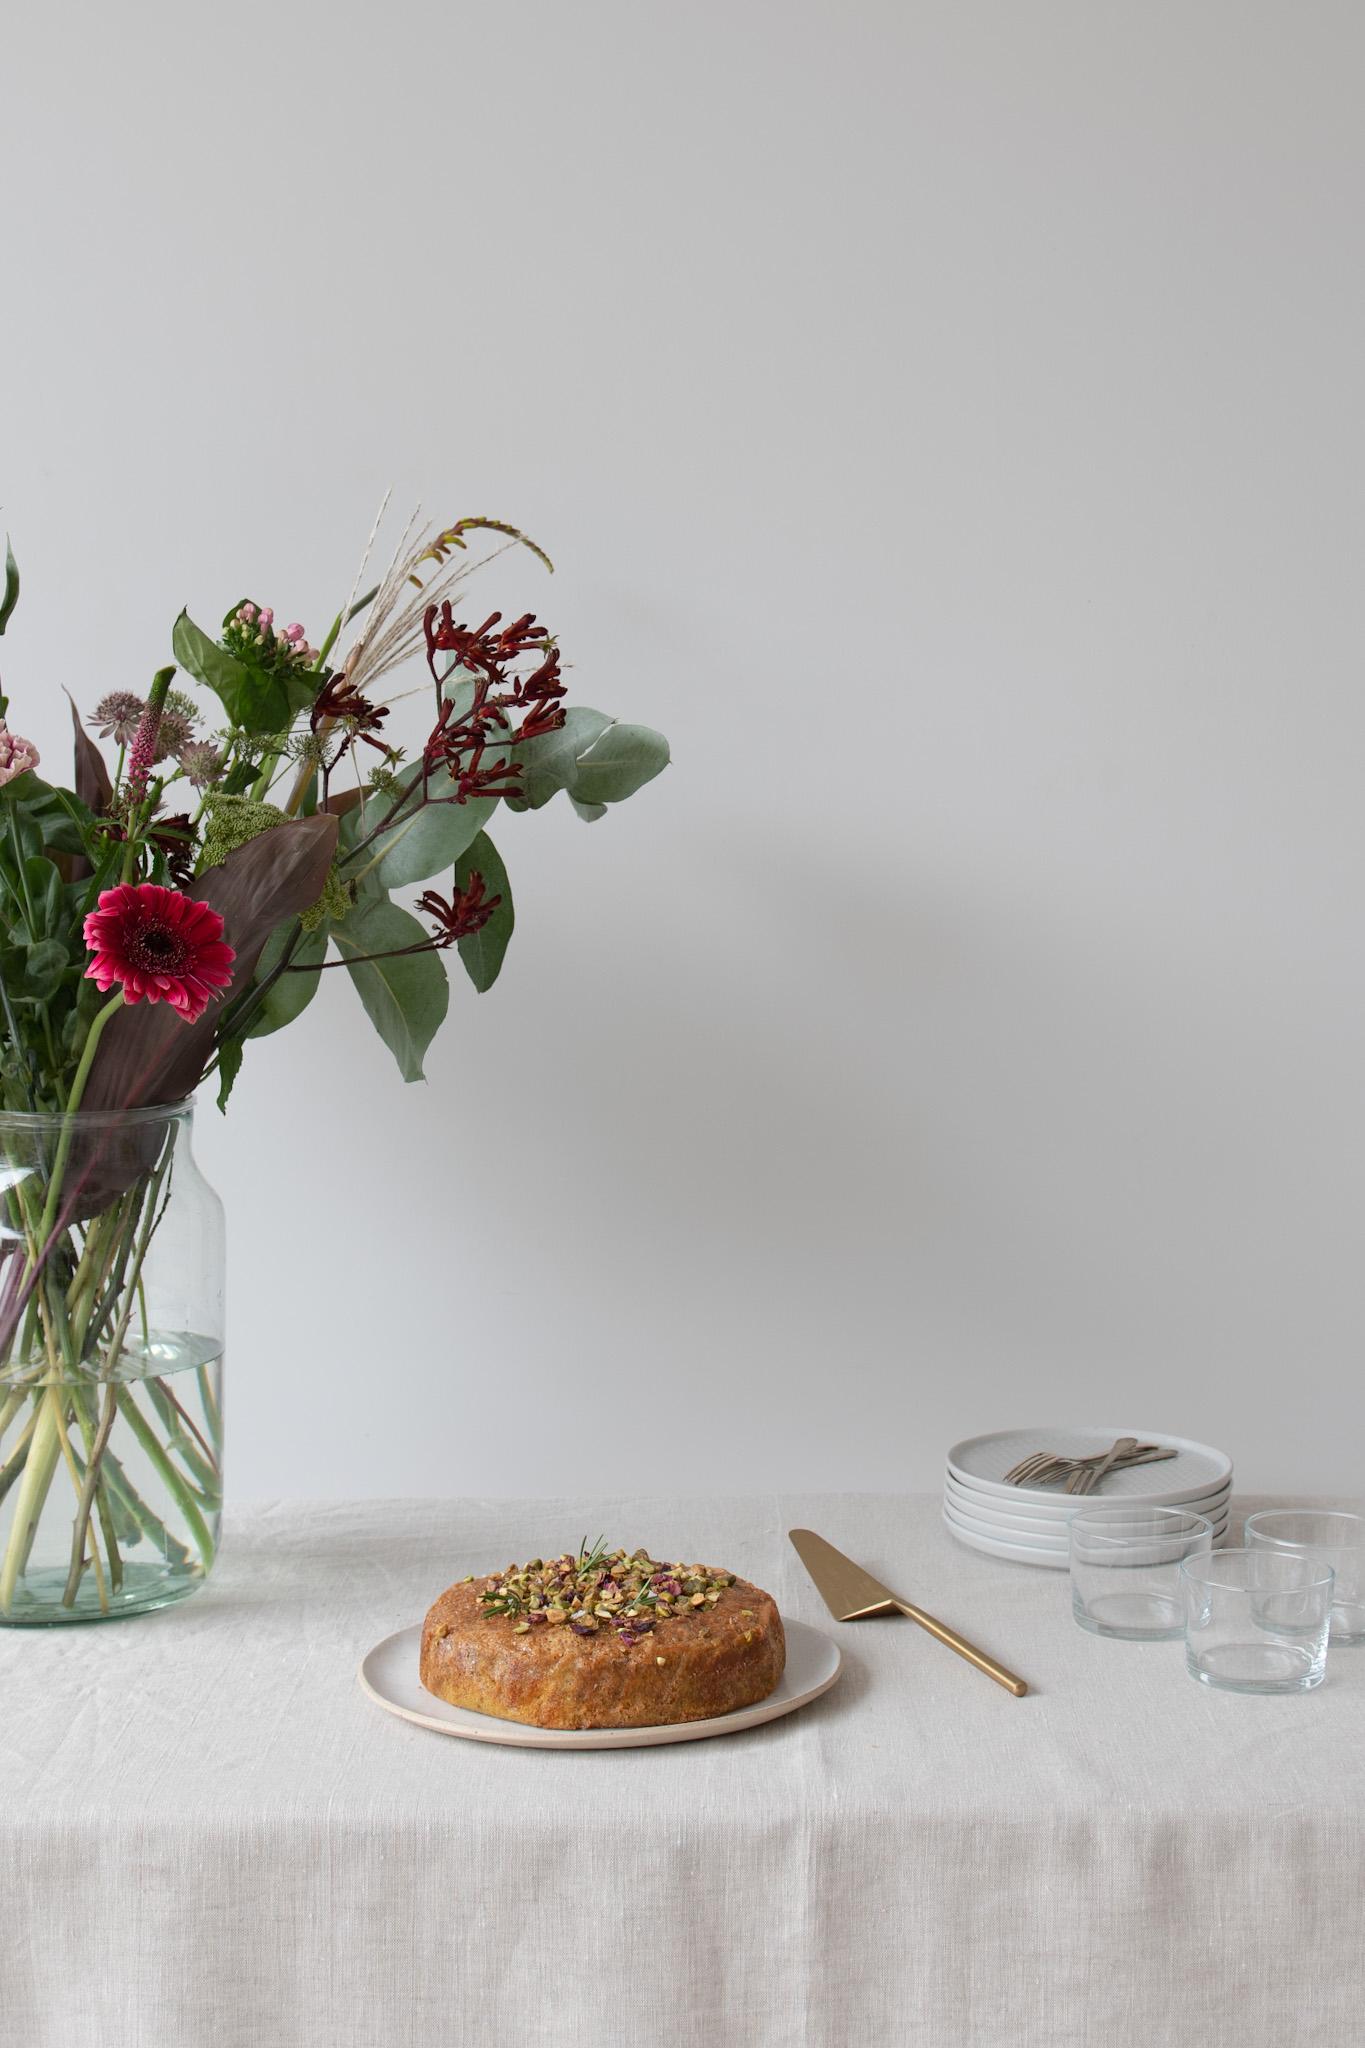 Ruby-Red Grapefruit, Pistachio & Rosemary Cake